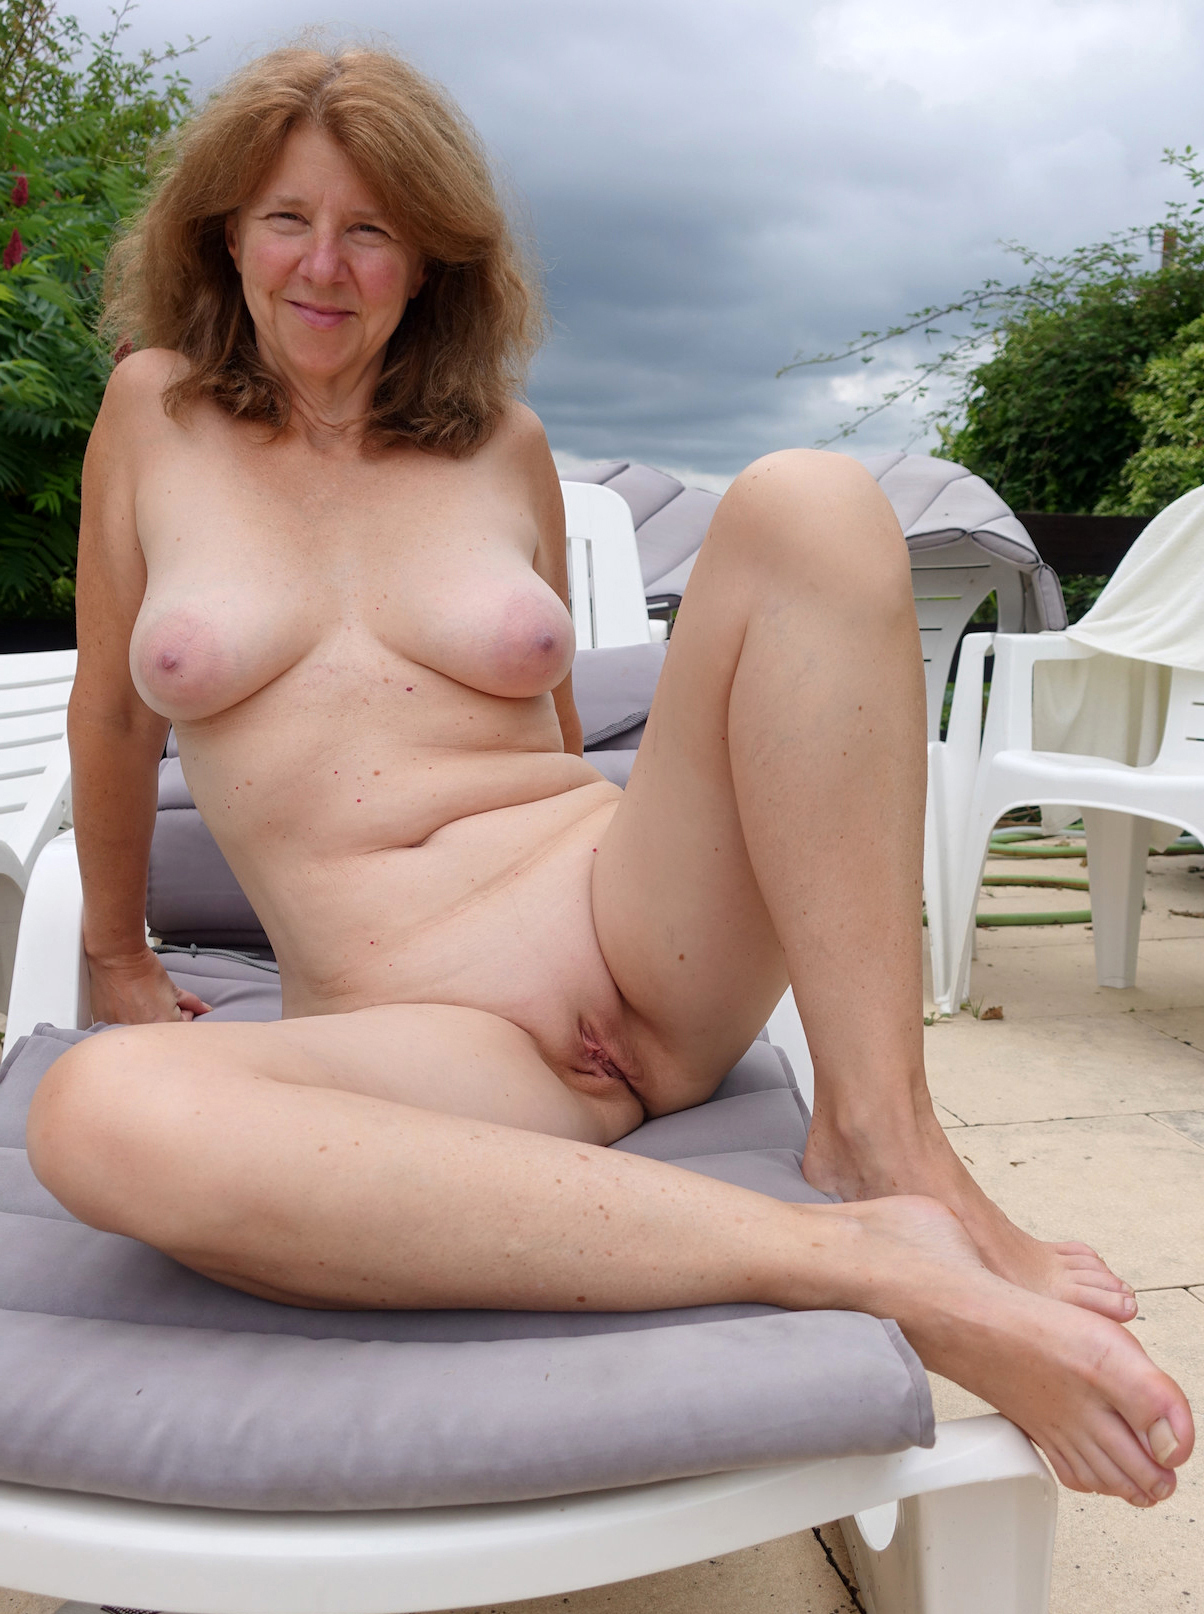 Ru nudist girl beach